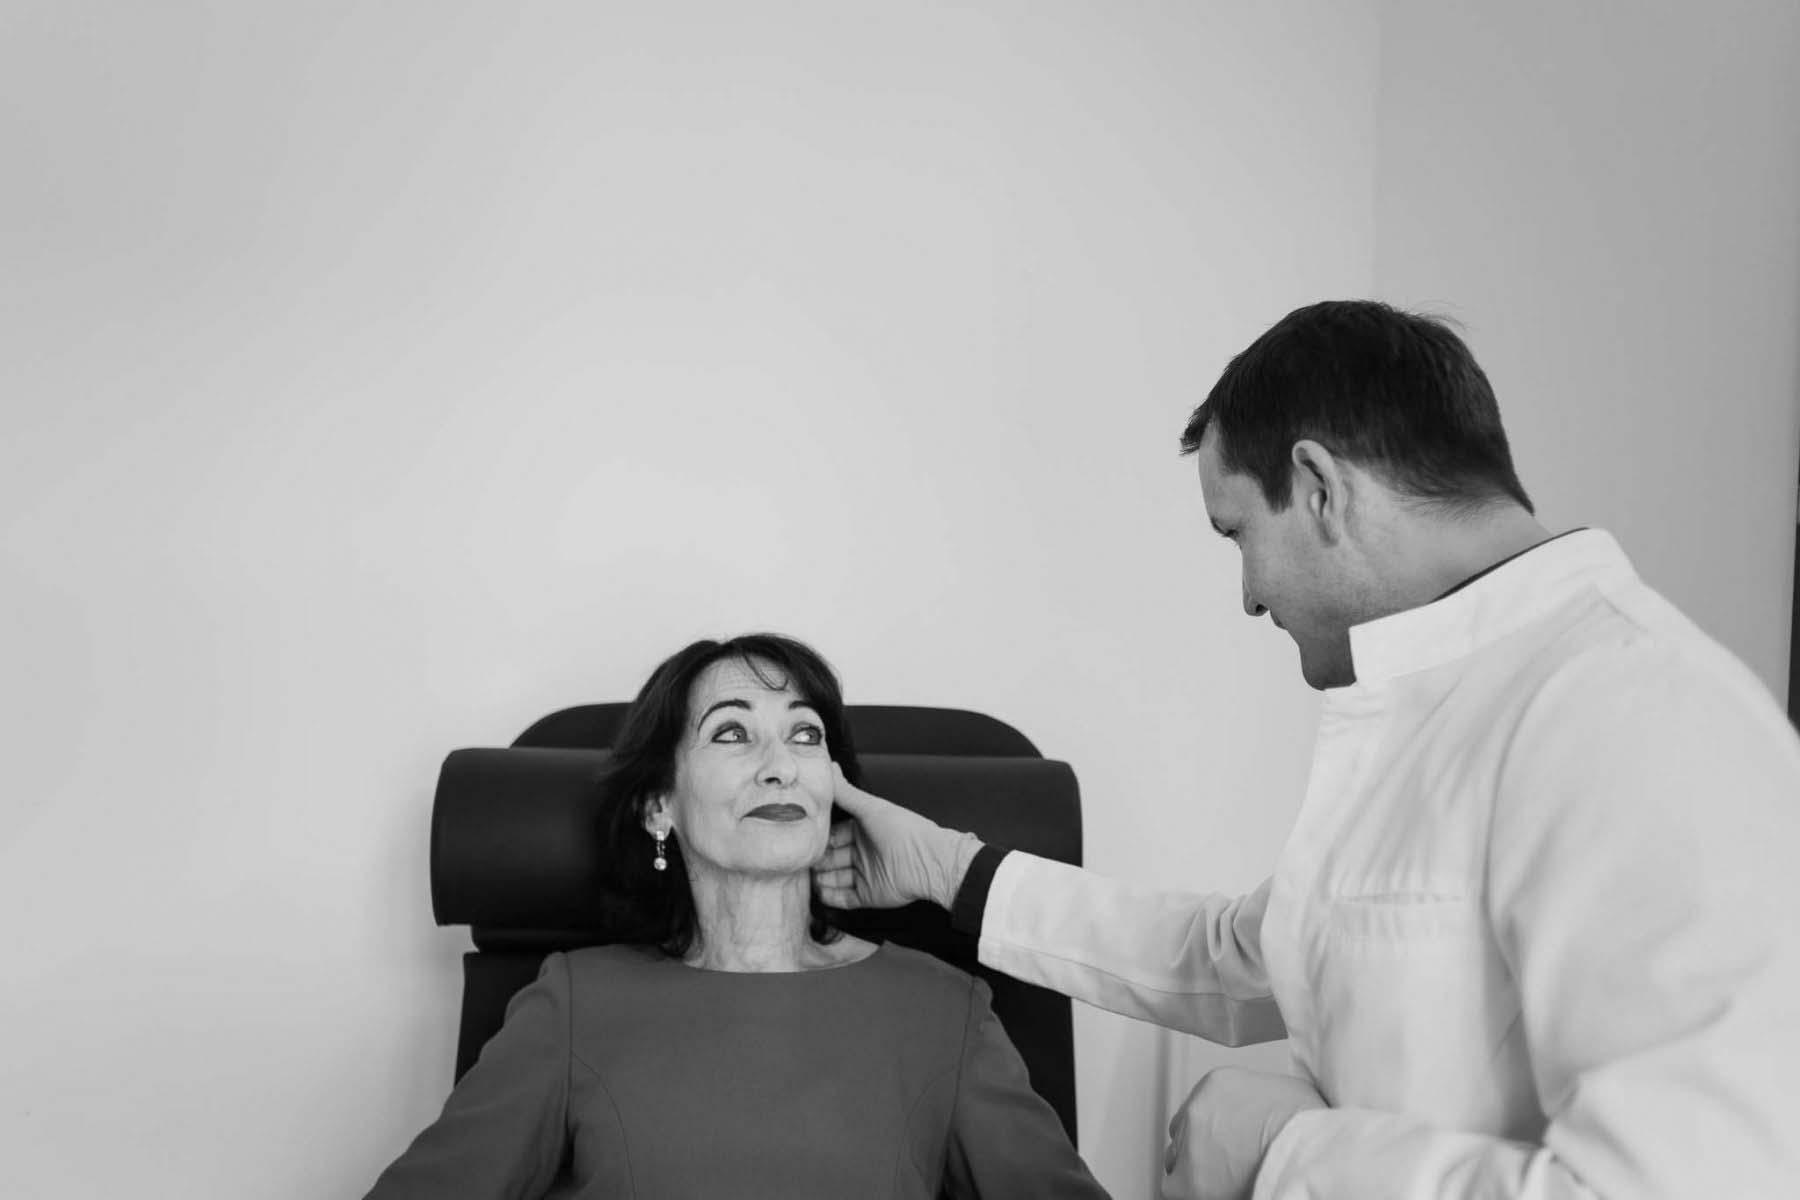 Facelifting zur Gesichtsstraffung